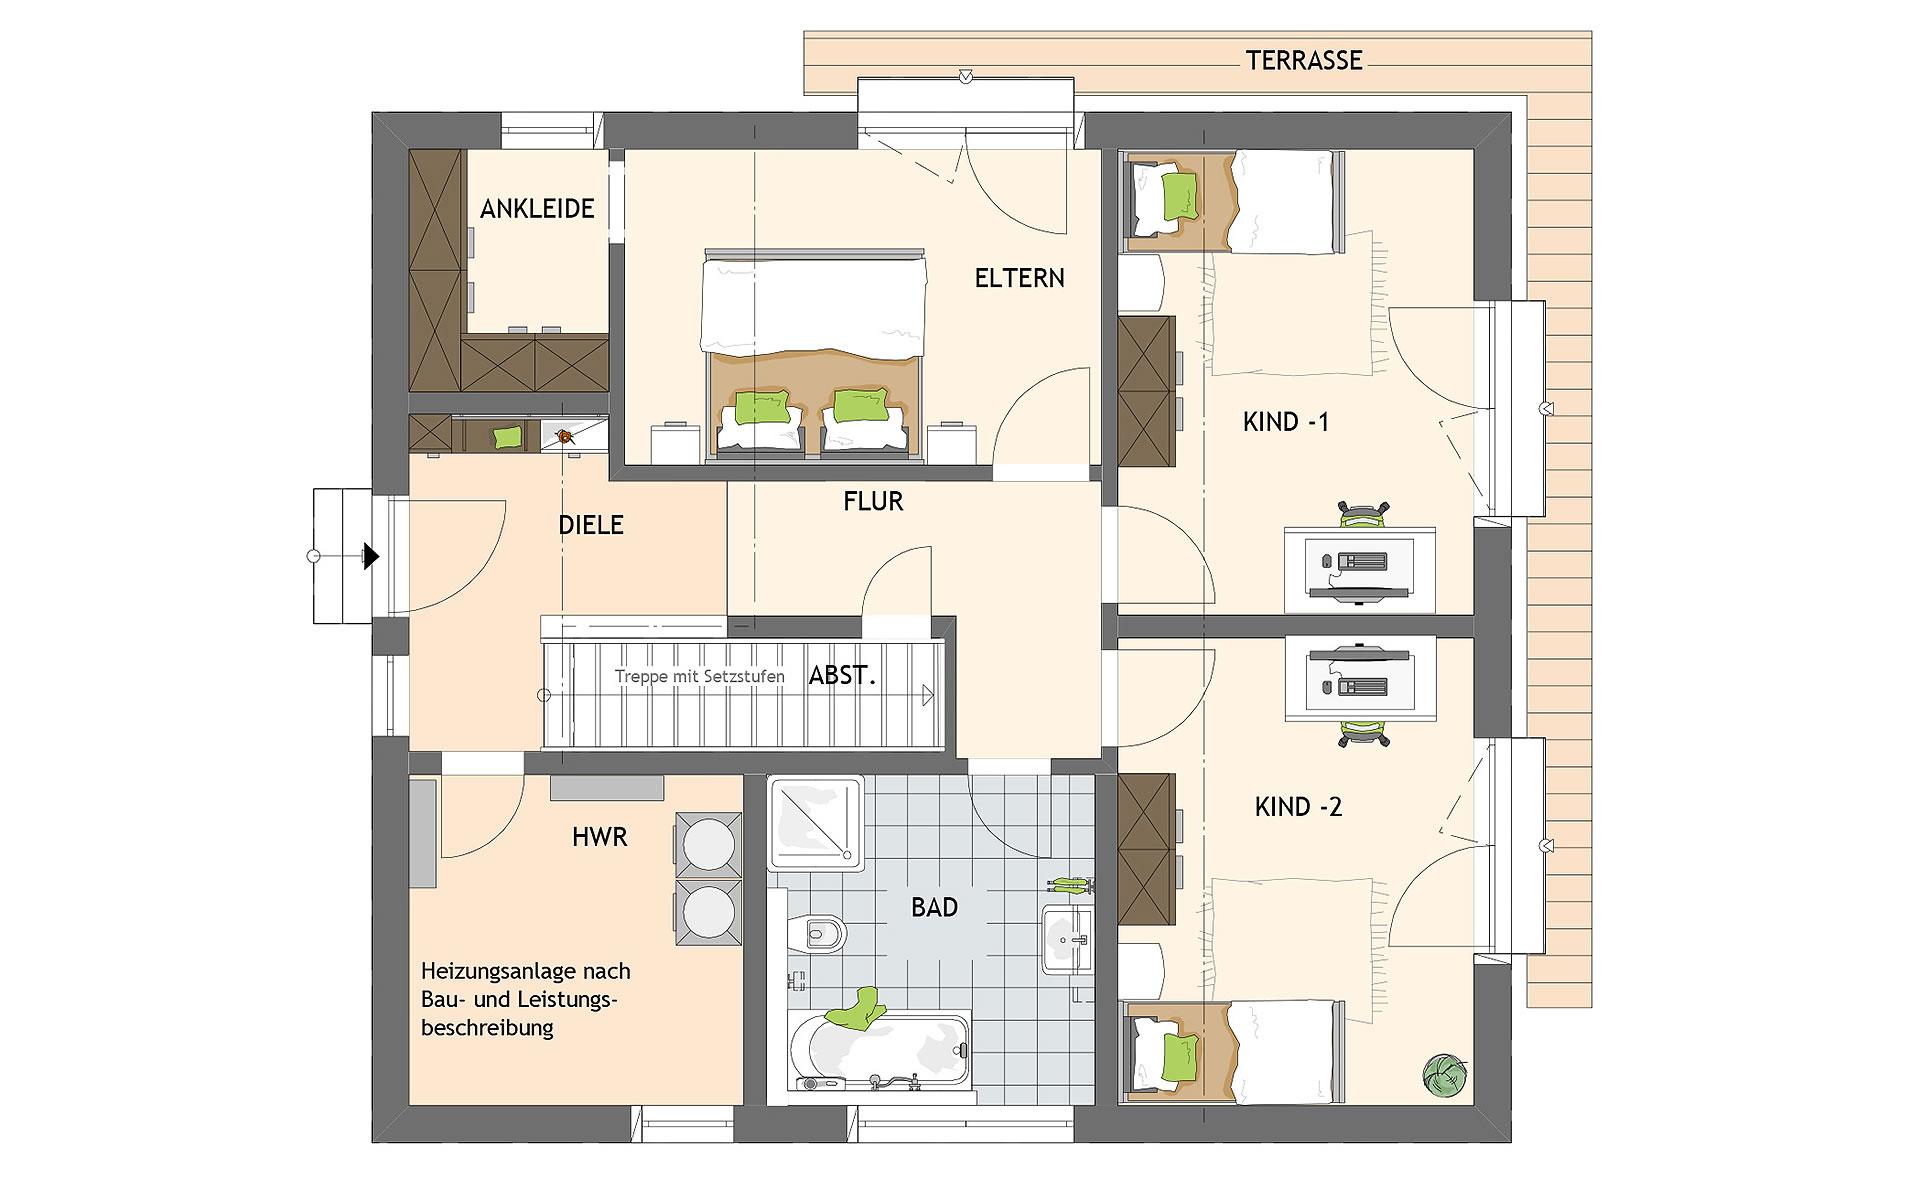 Erdgeschoss ARTIS 301 von FingerHaus GmbH